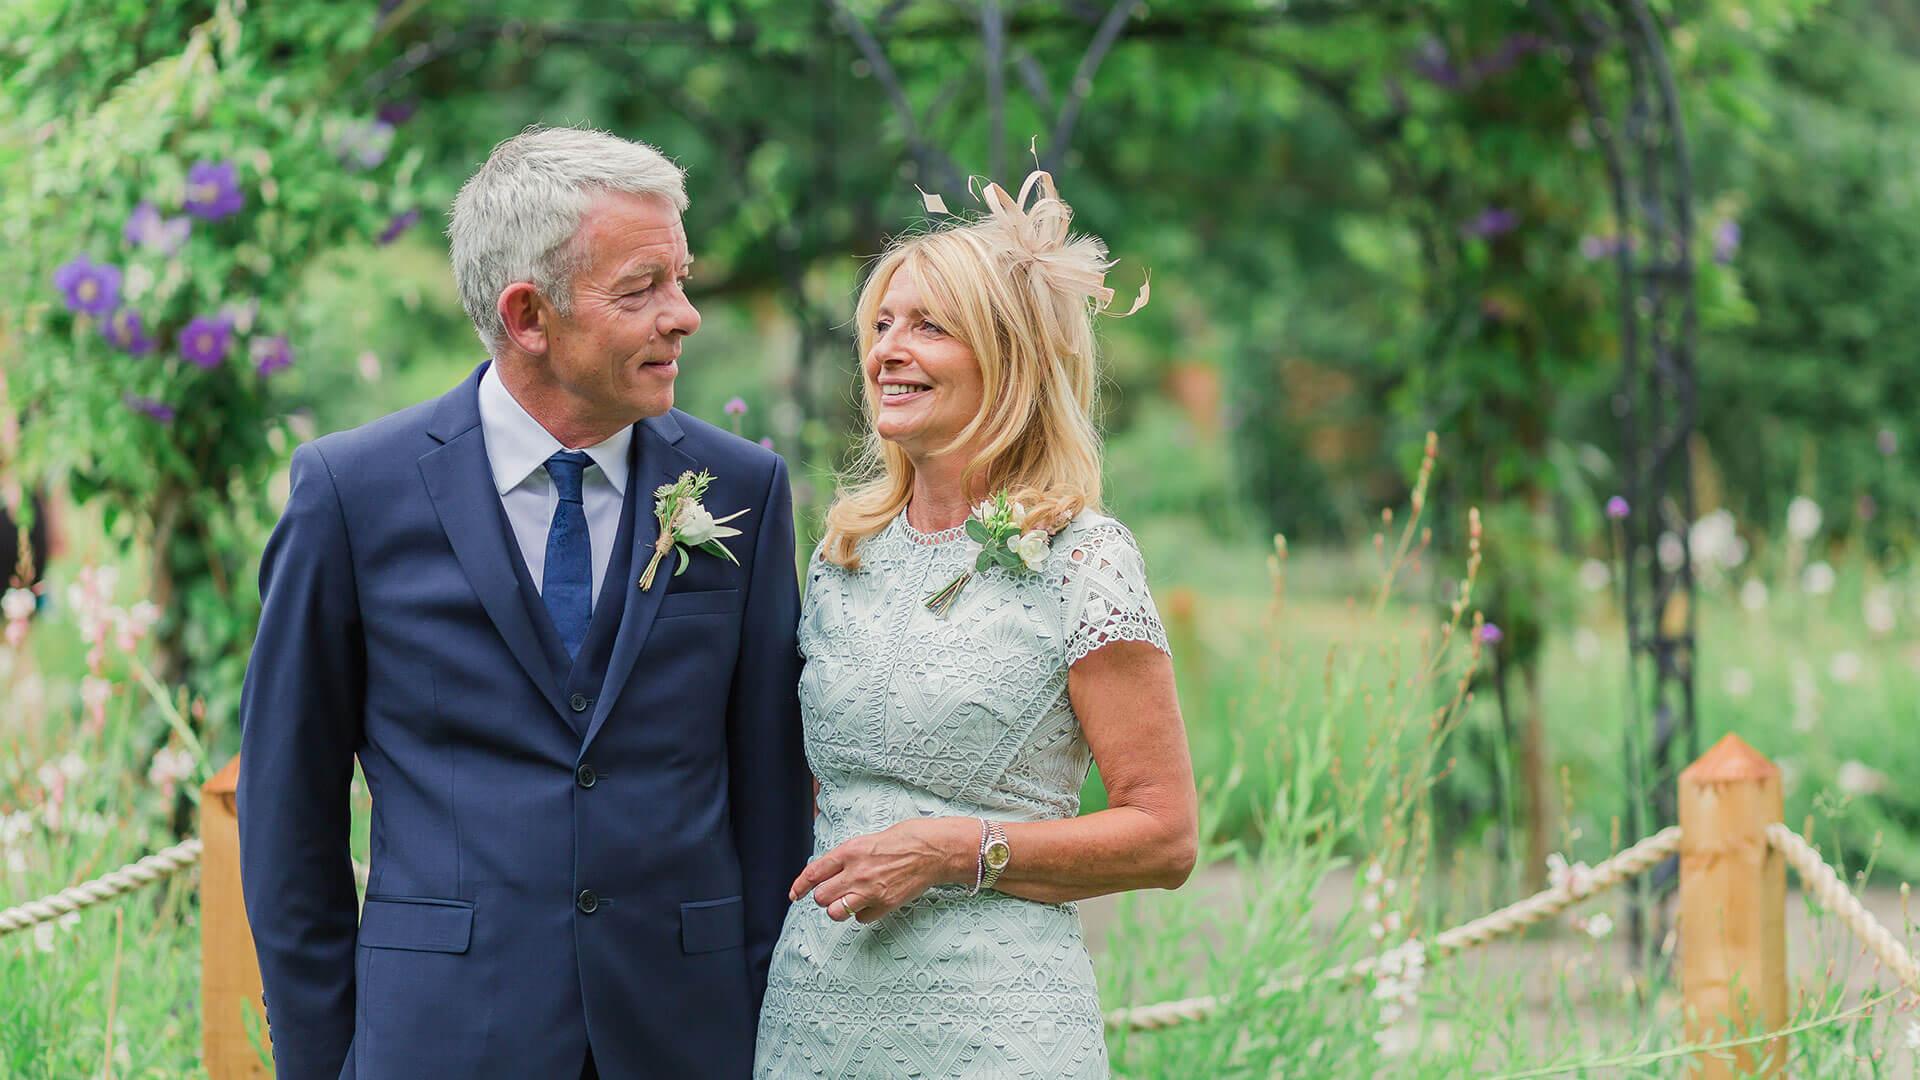 Gaynes Park is a beautiful barn wedding perfect for a summer wedding